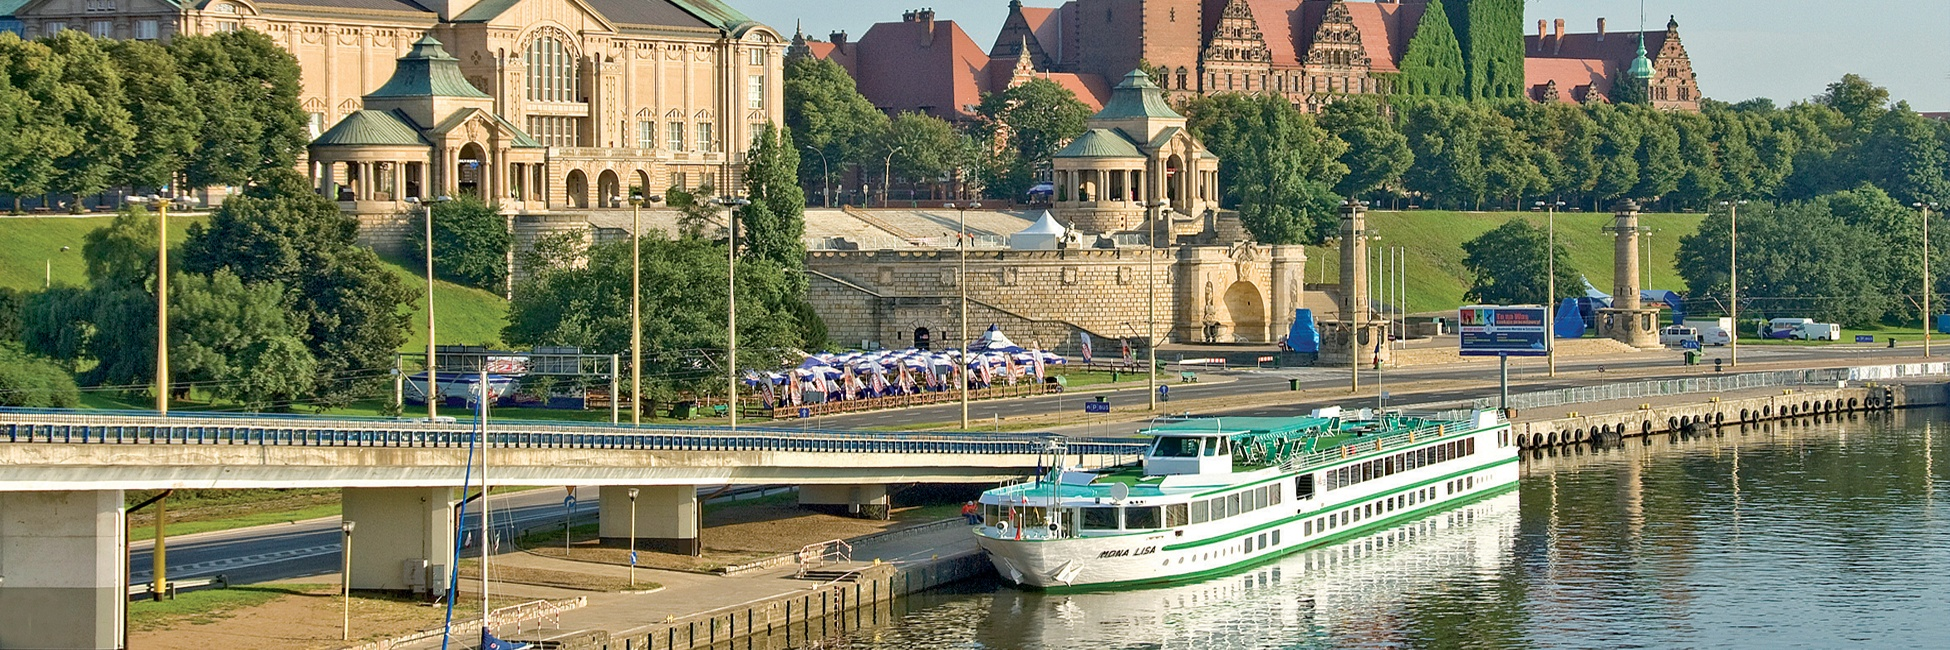 MS Mona Lisa à Szczecin en Pologne